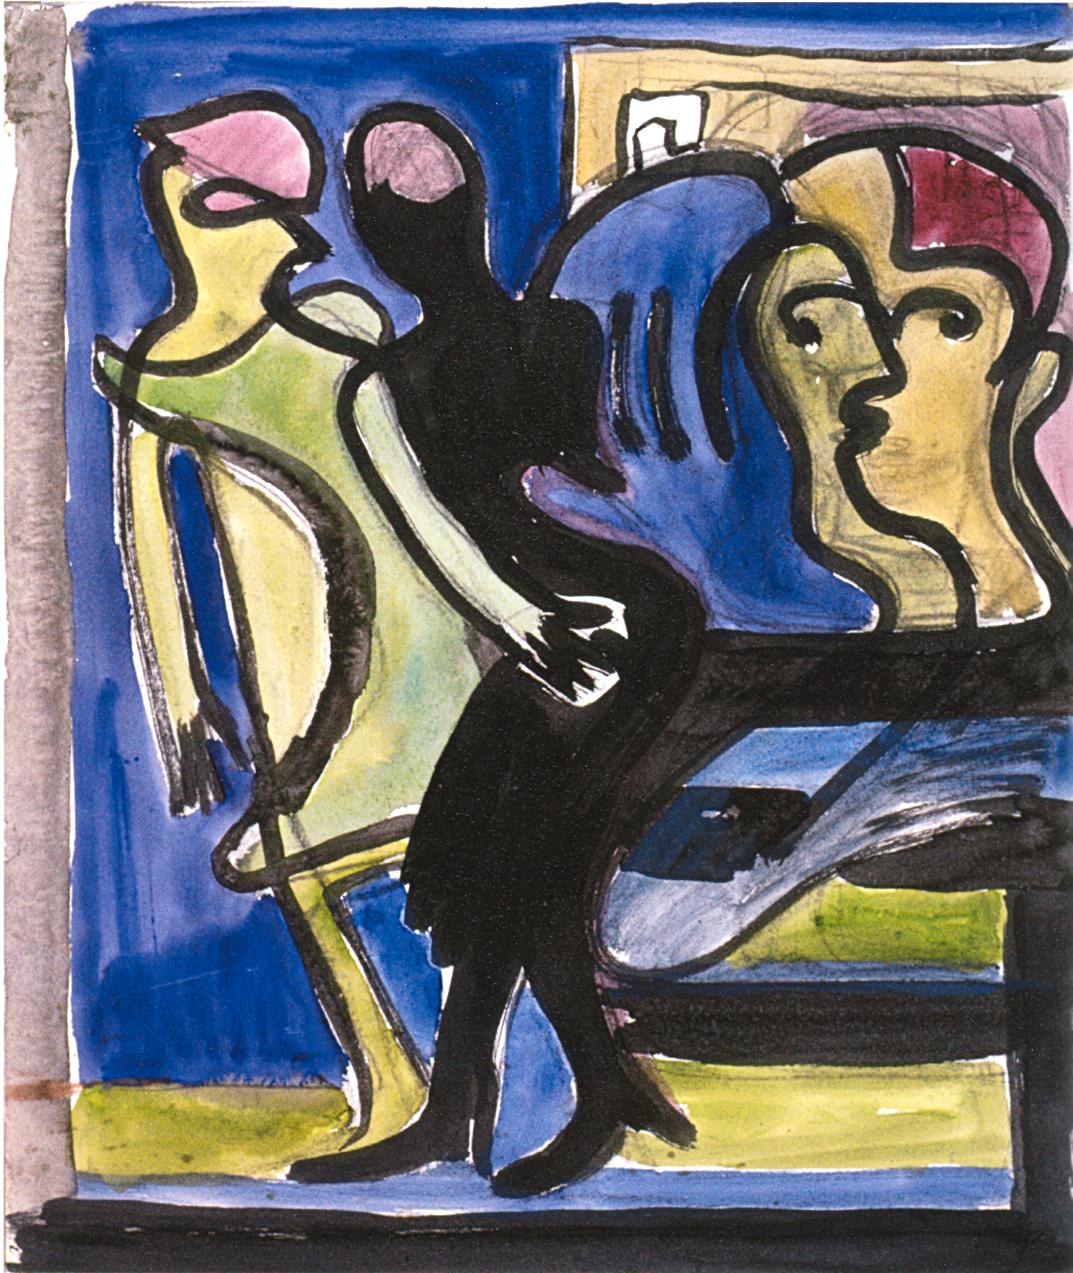 Ernst Ludwig Kirchner - Strasenszene - Durchblick in Cafe 1935 - Quelle: WikiCommons, siehe Angabe im Artikel